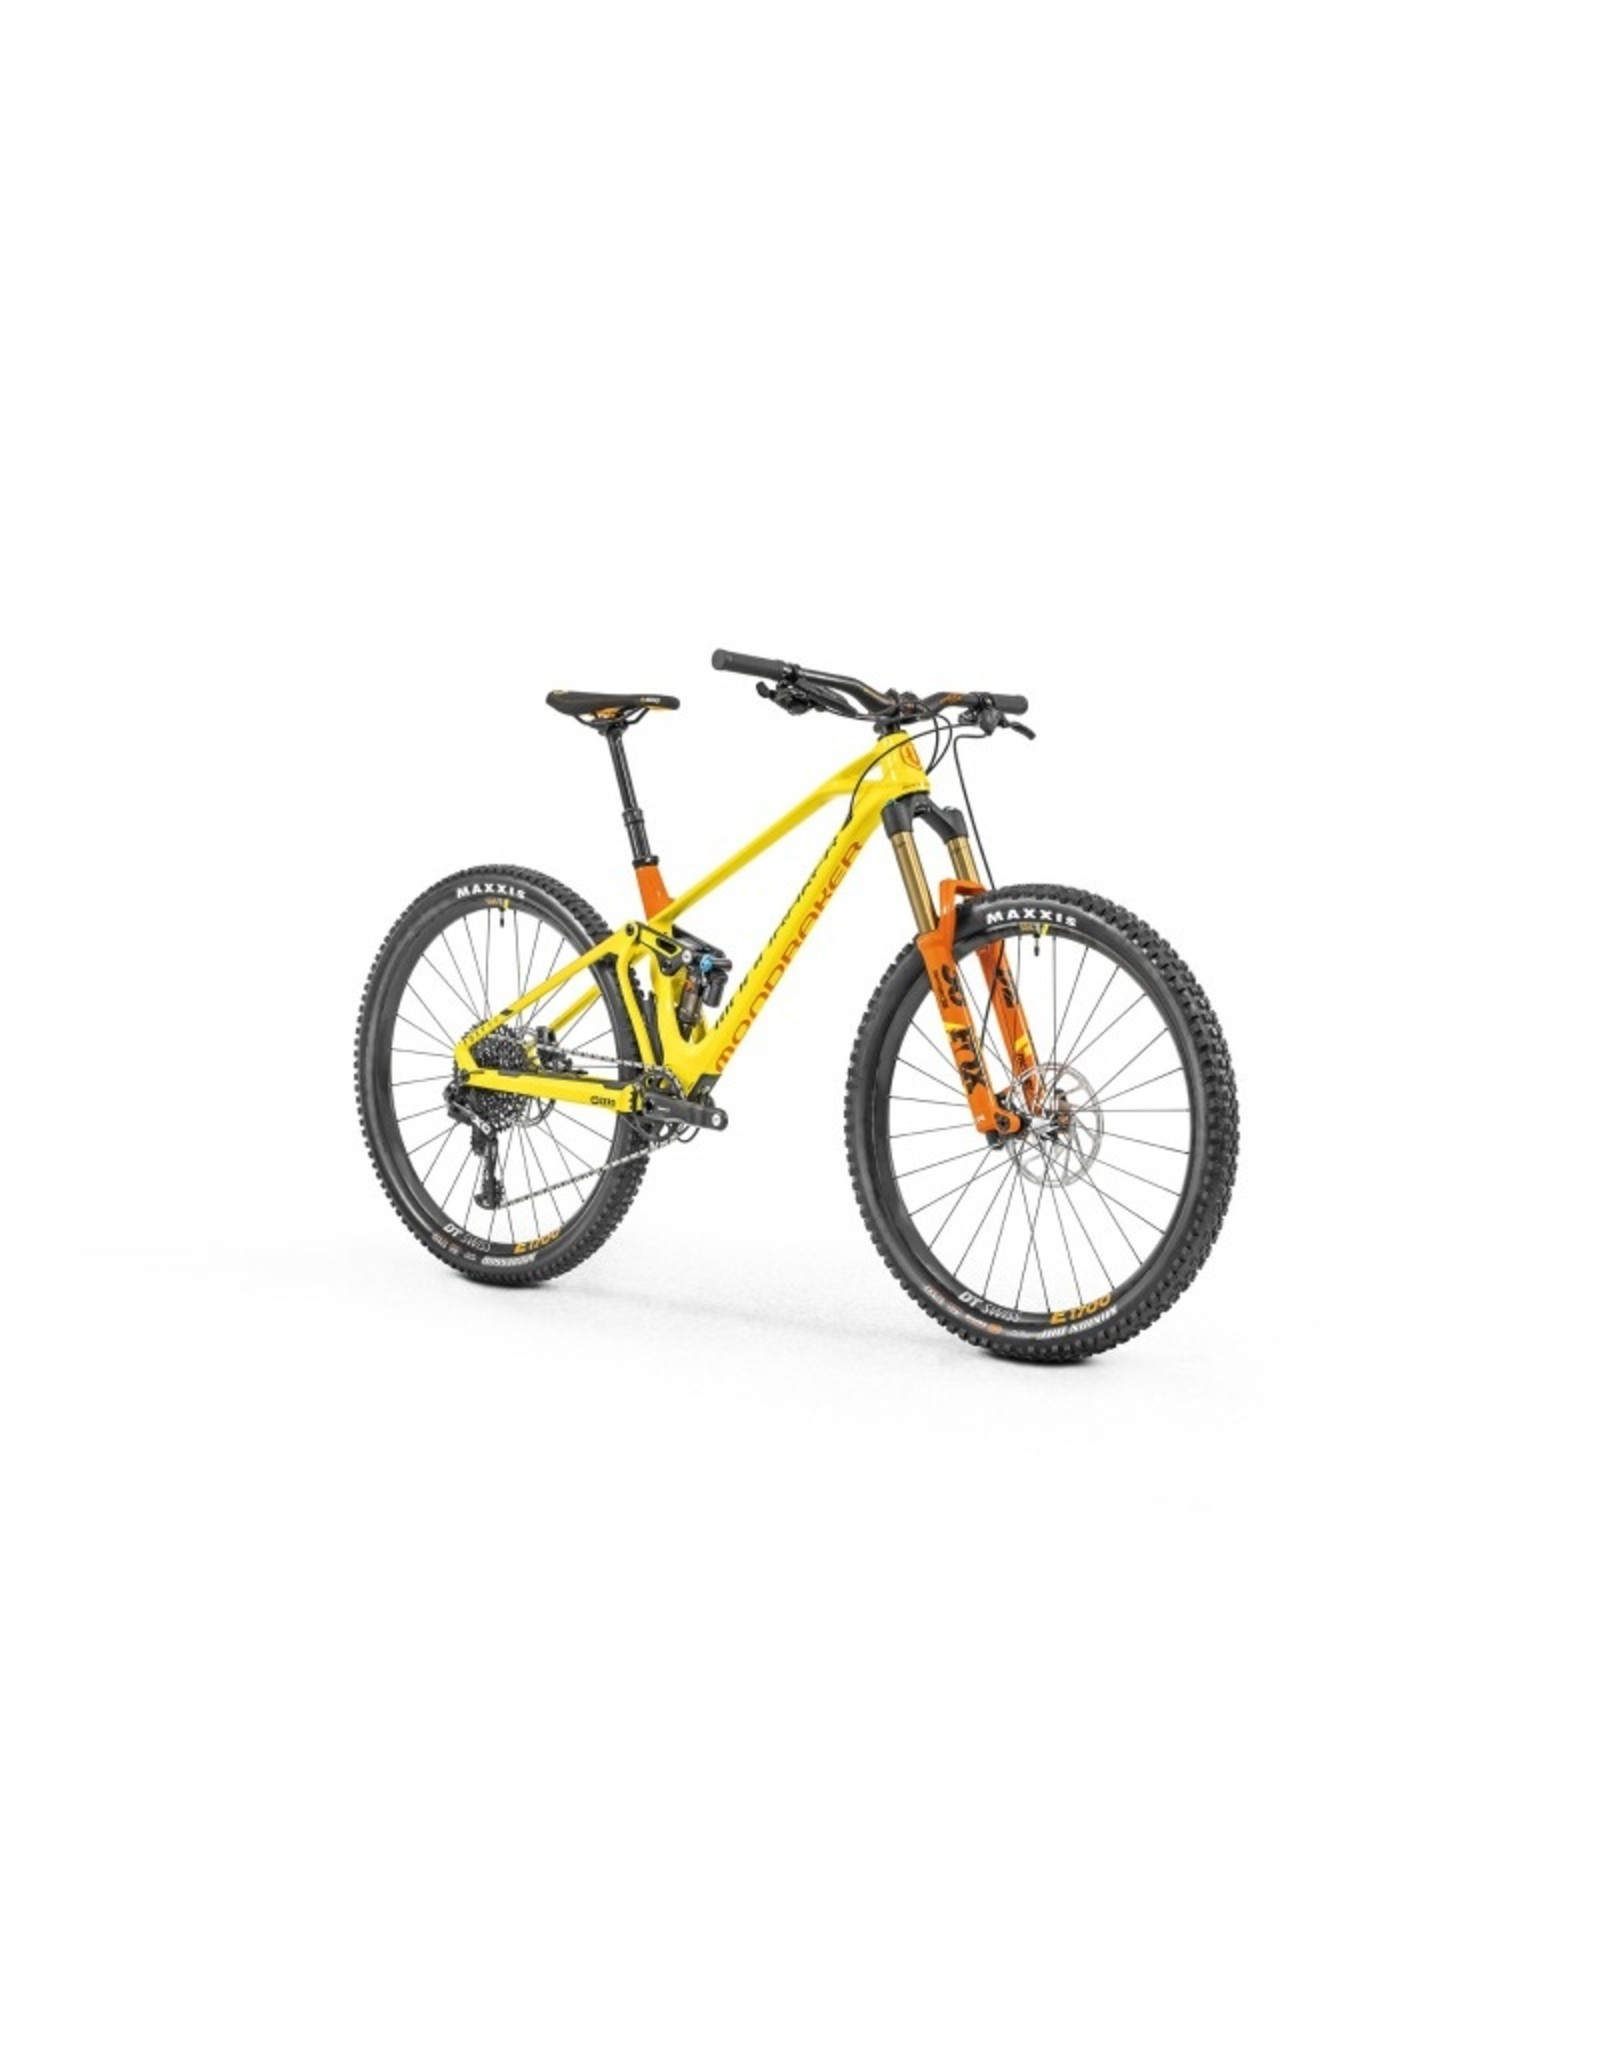 "Mondraker Mondraker Foxy Carbon RR 29"" Small Yellow 2019"